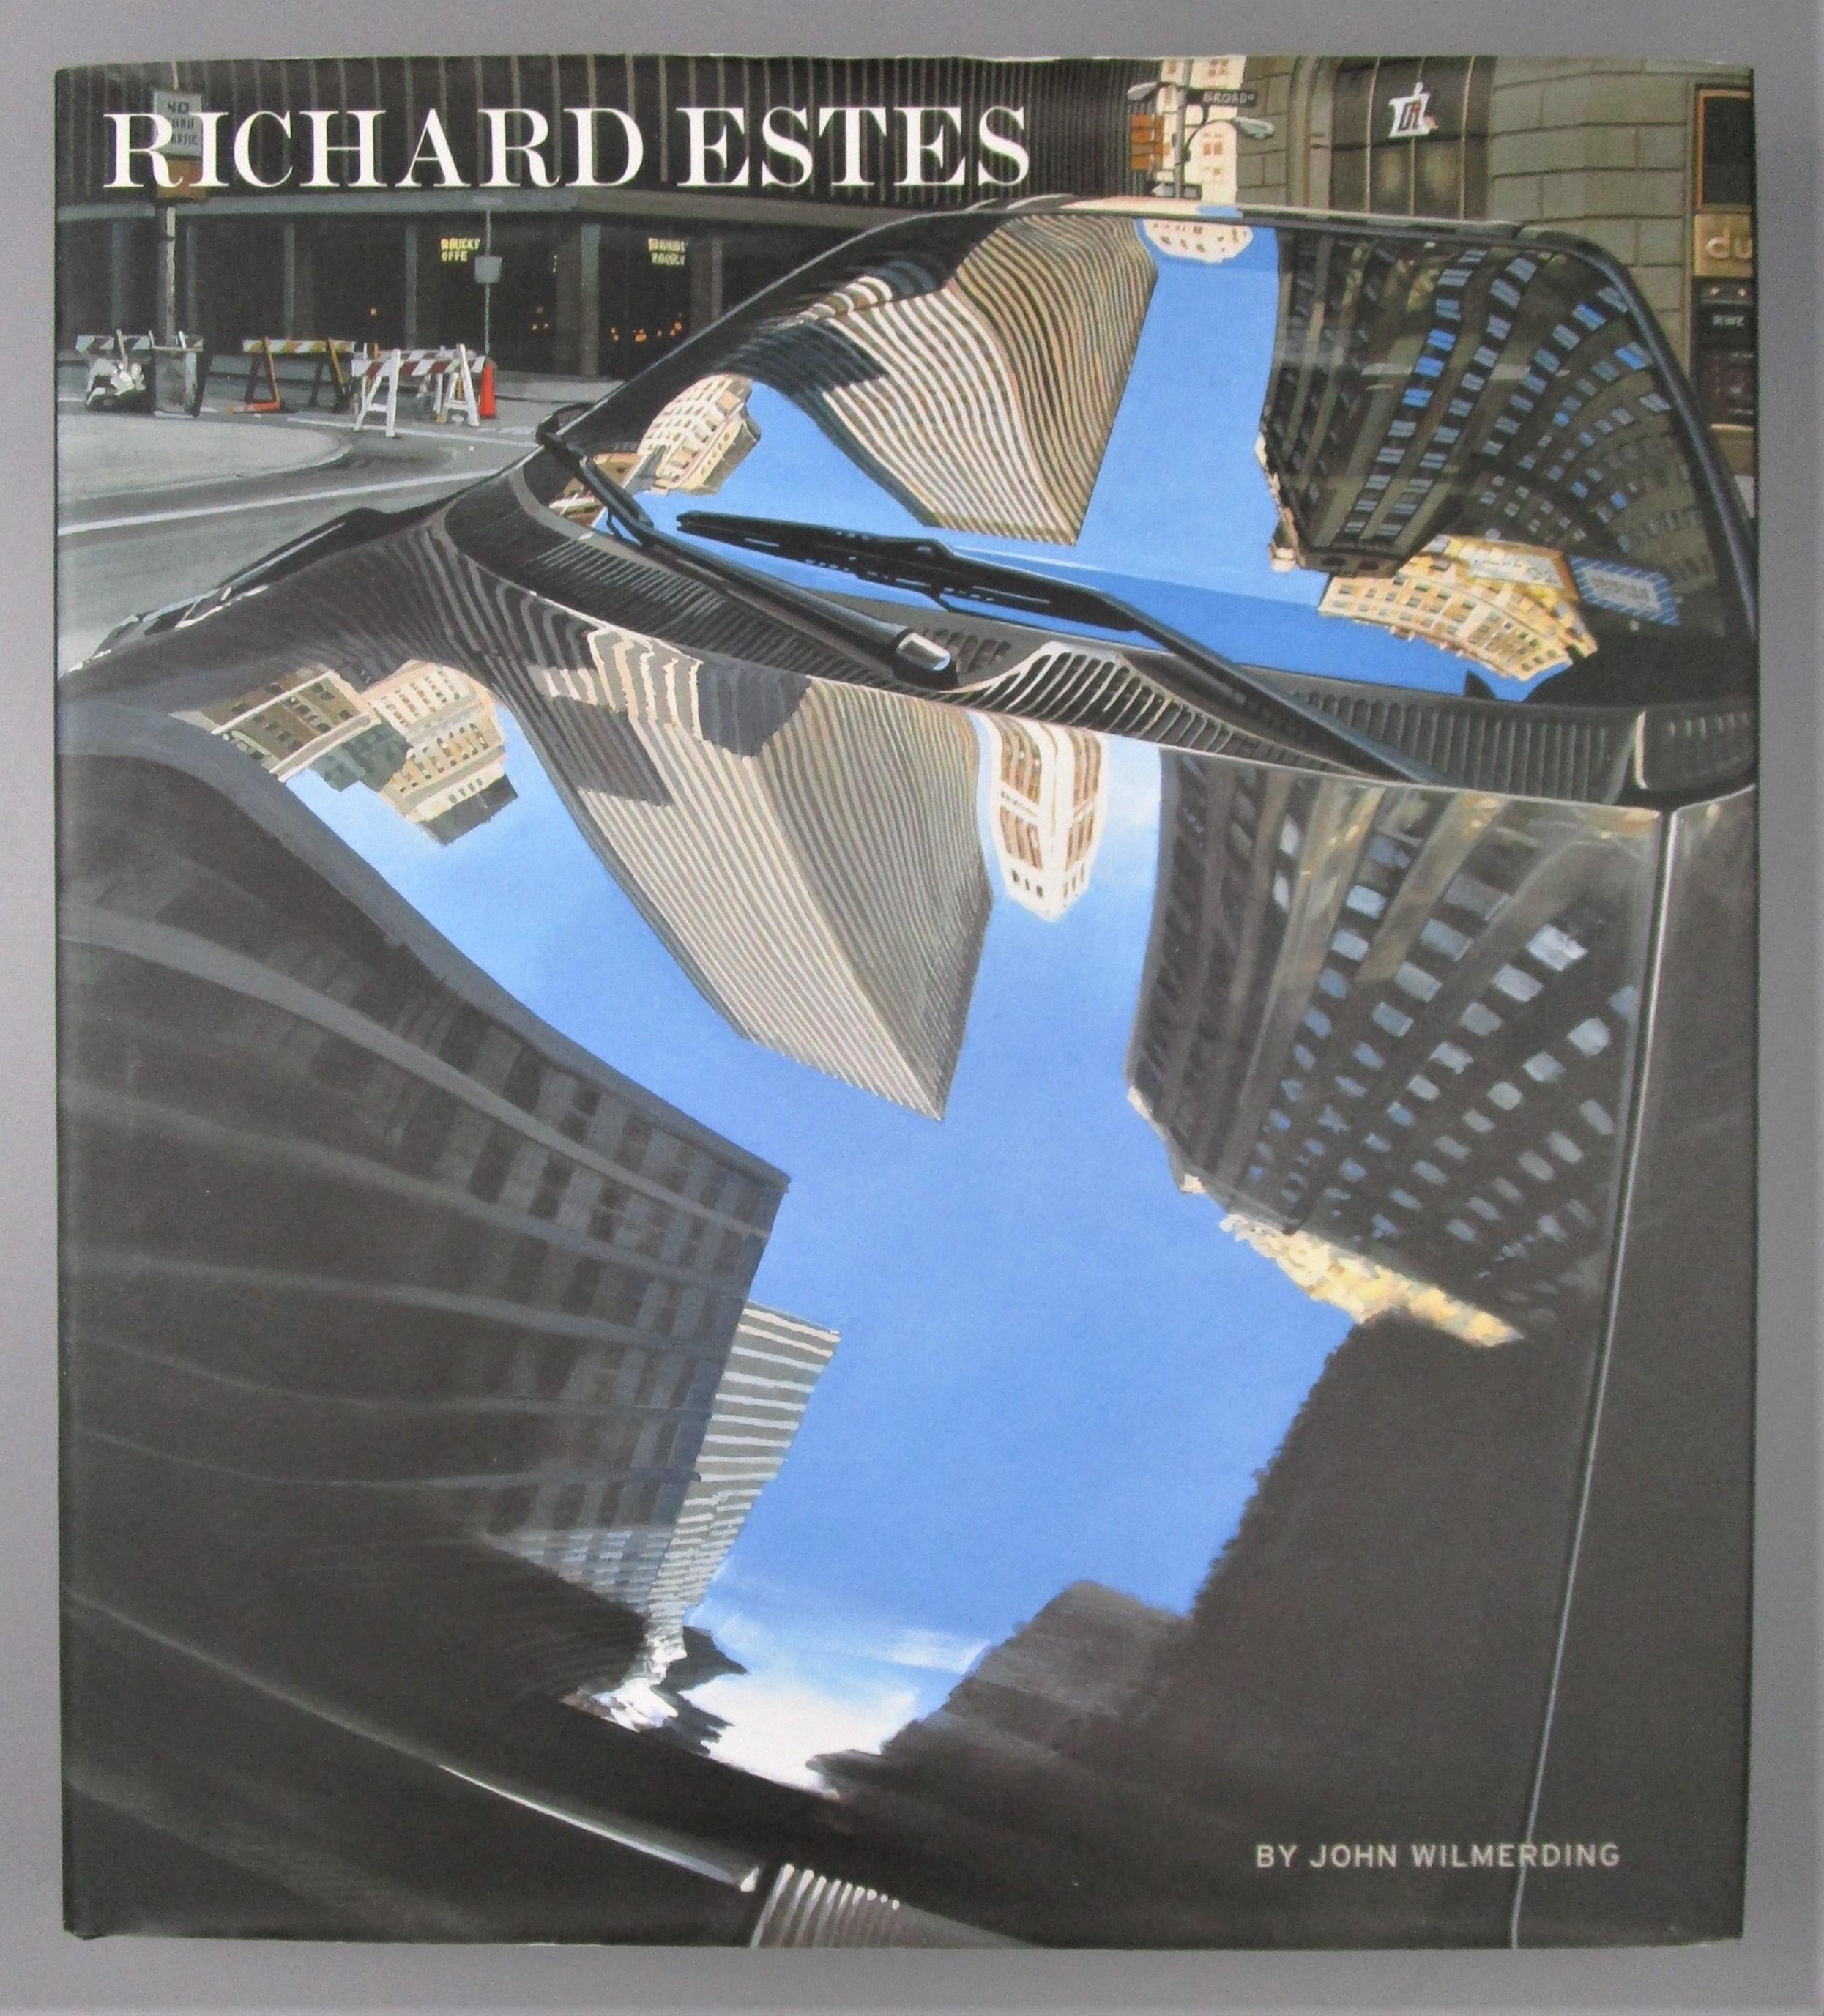 RICHARD ESTES, by John Wilmerding - 2006 [Signed]